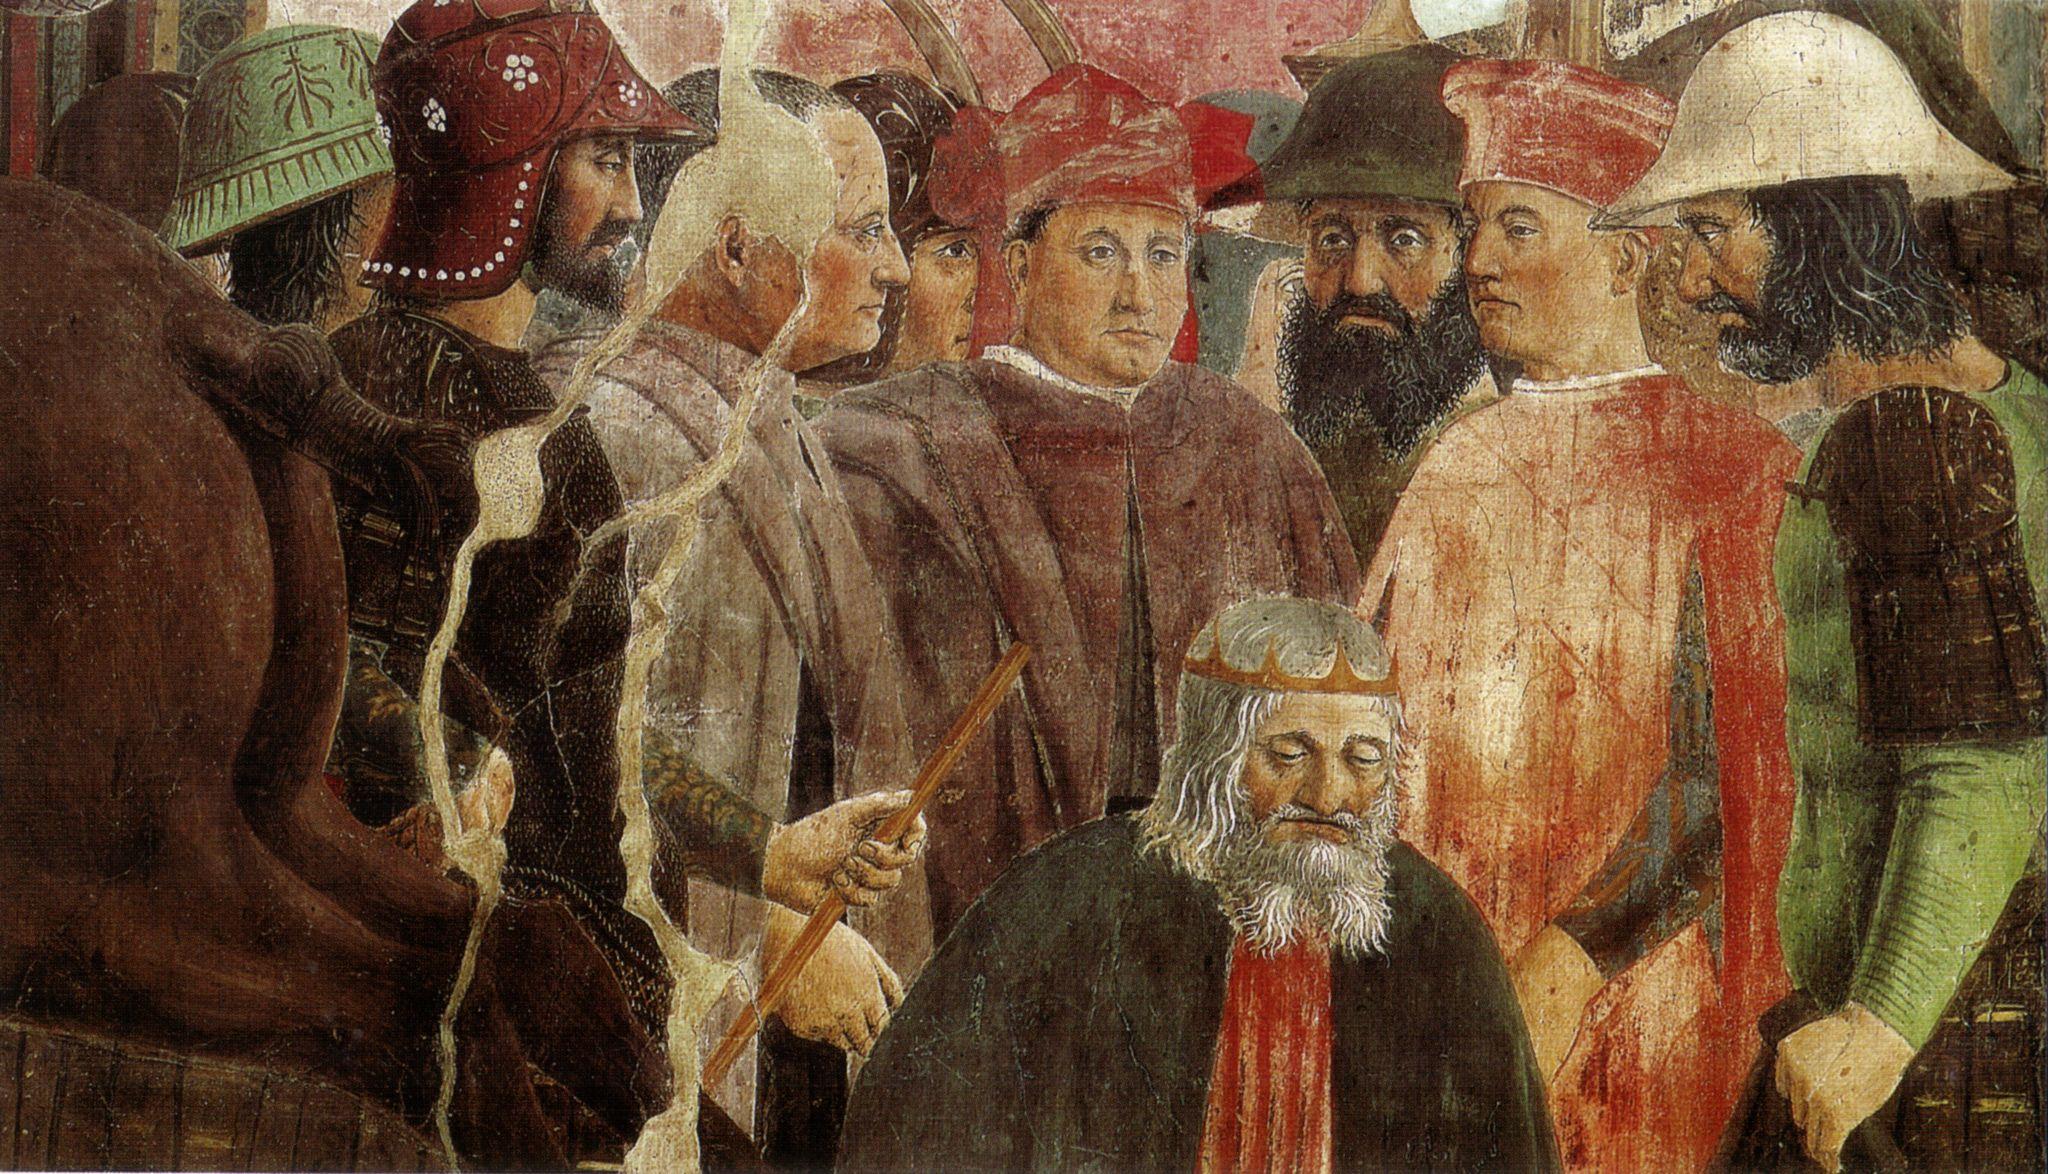 Piero, esecuzione di cosroe